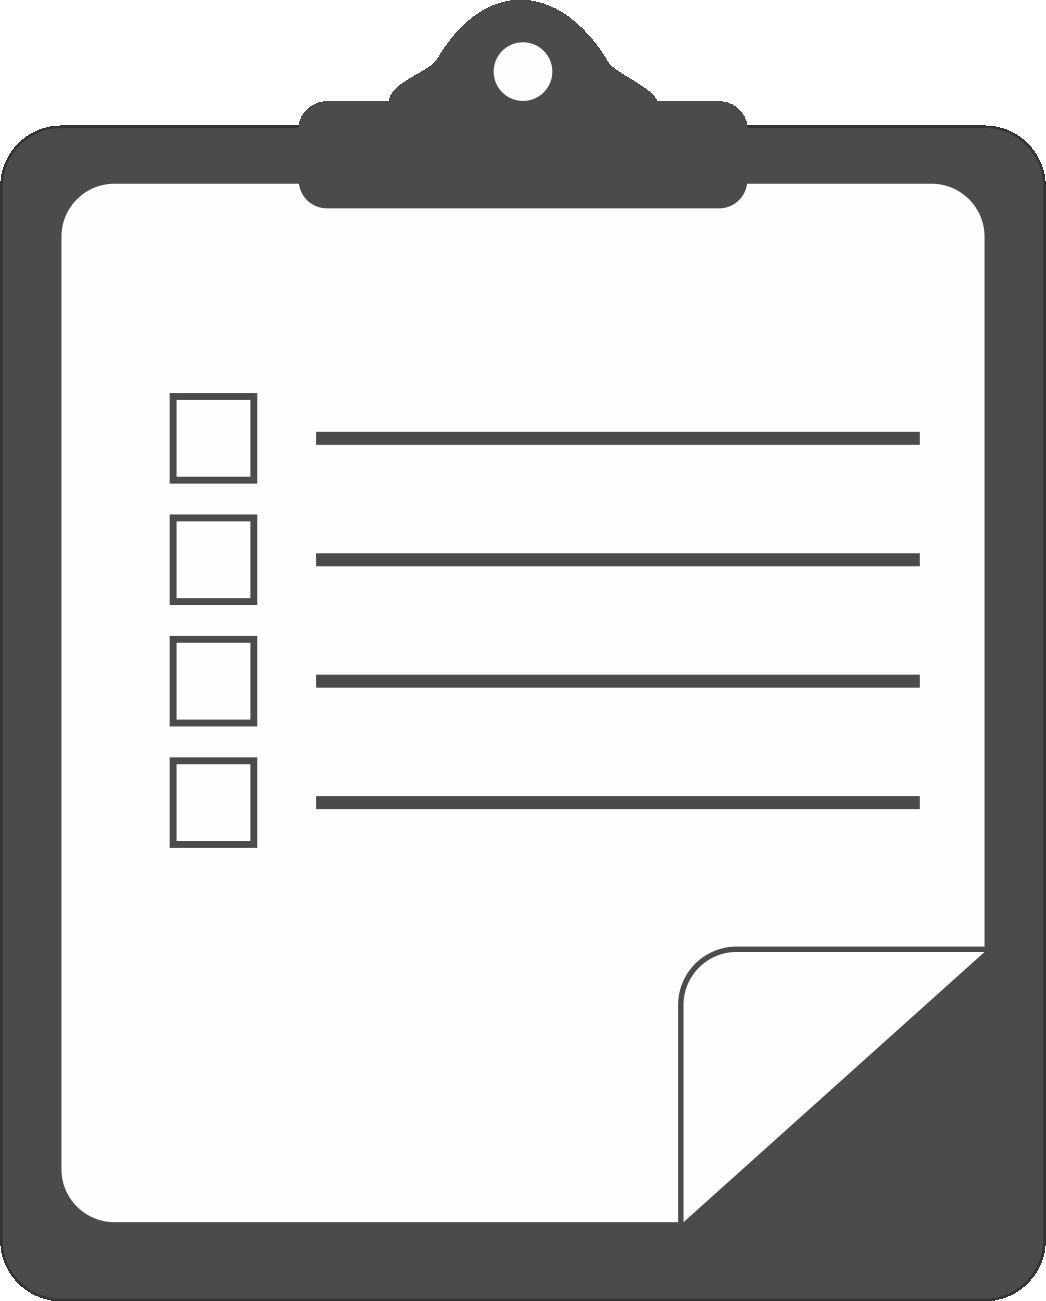 Today Checklist Clipart Clip art of Checklist Clipart #3816.